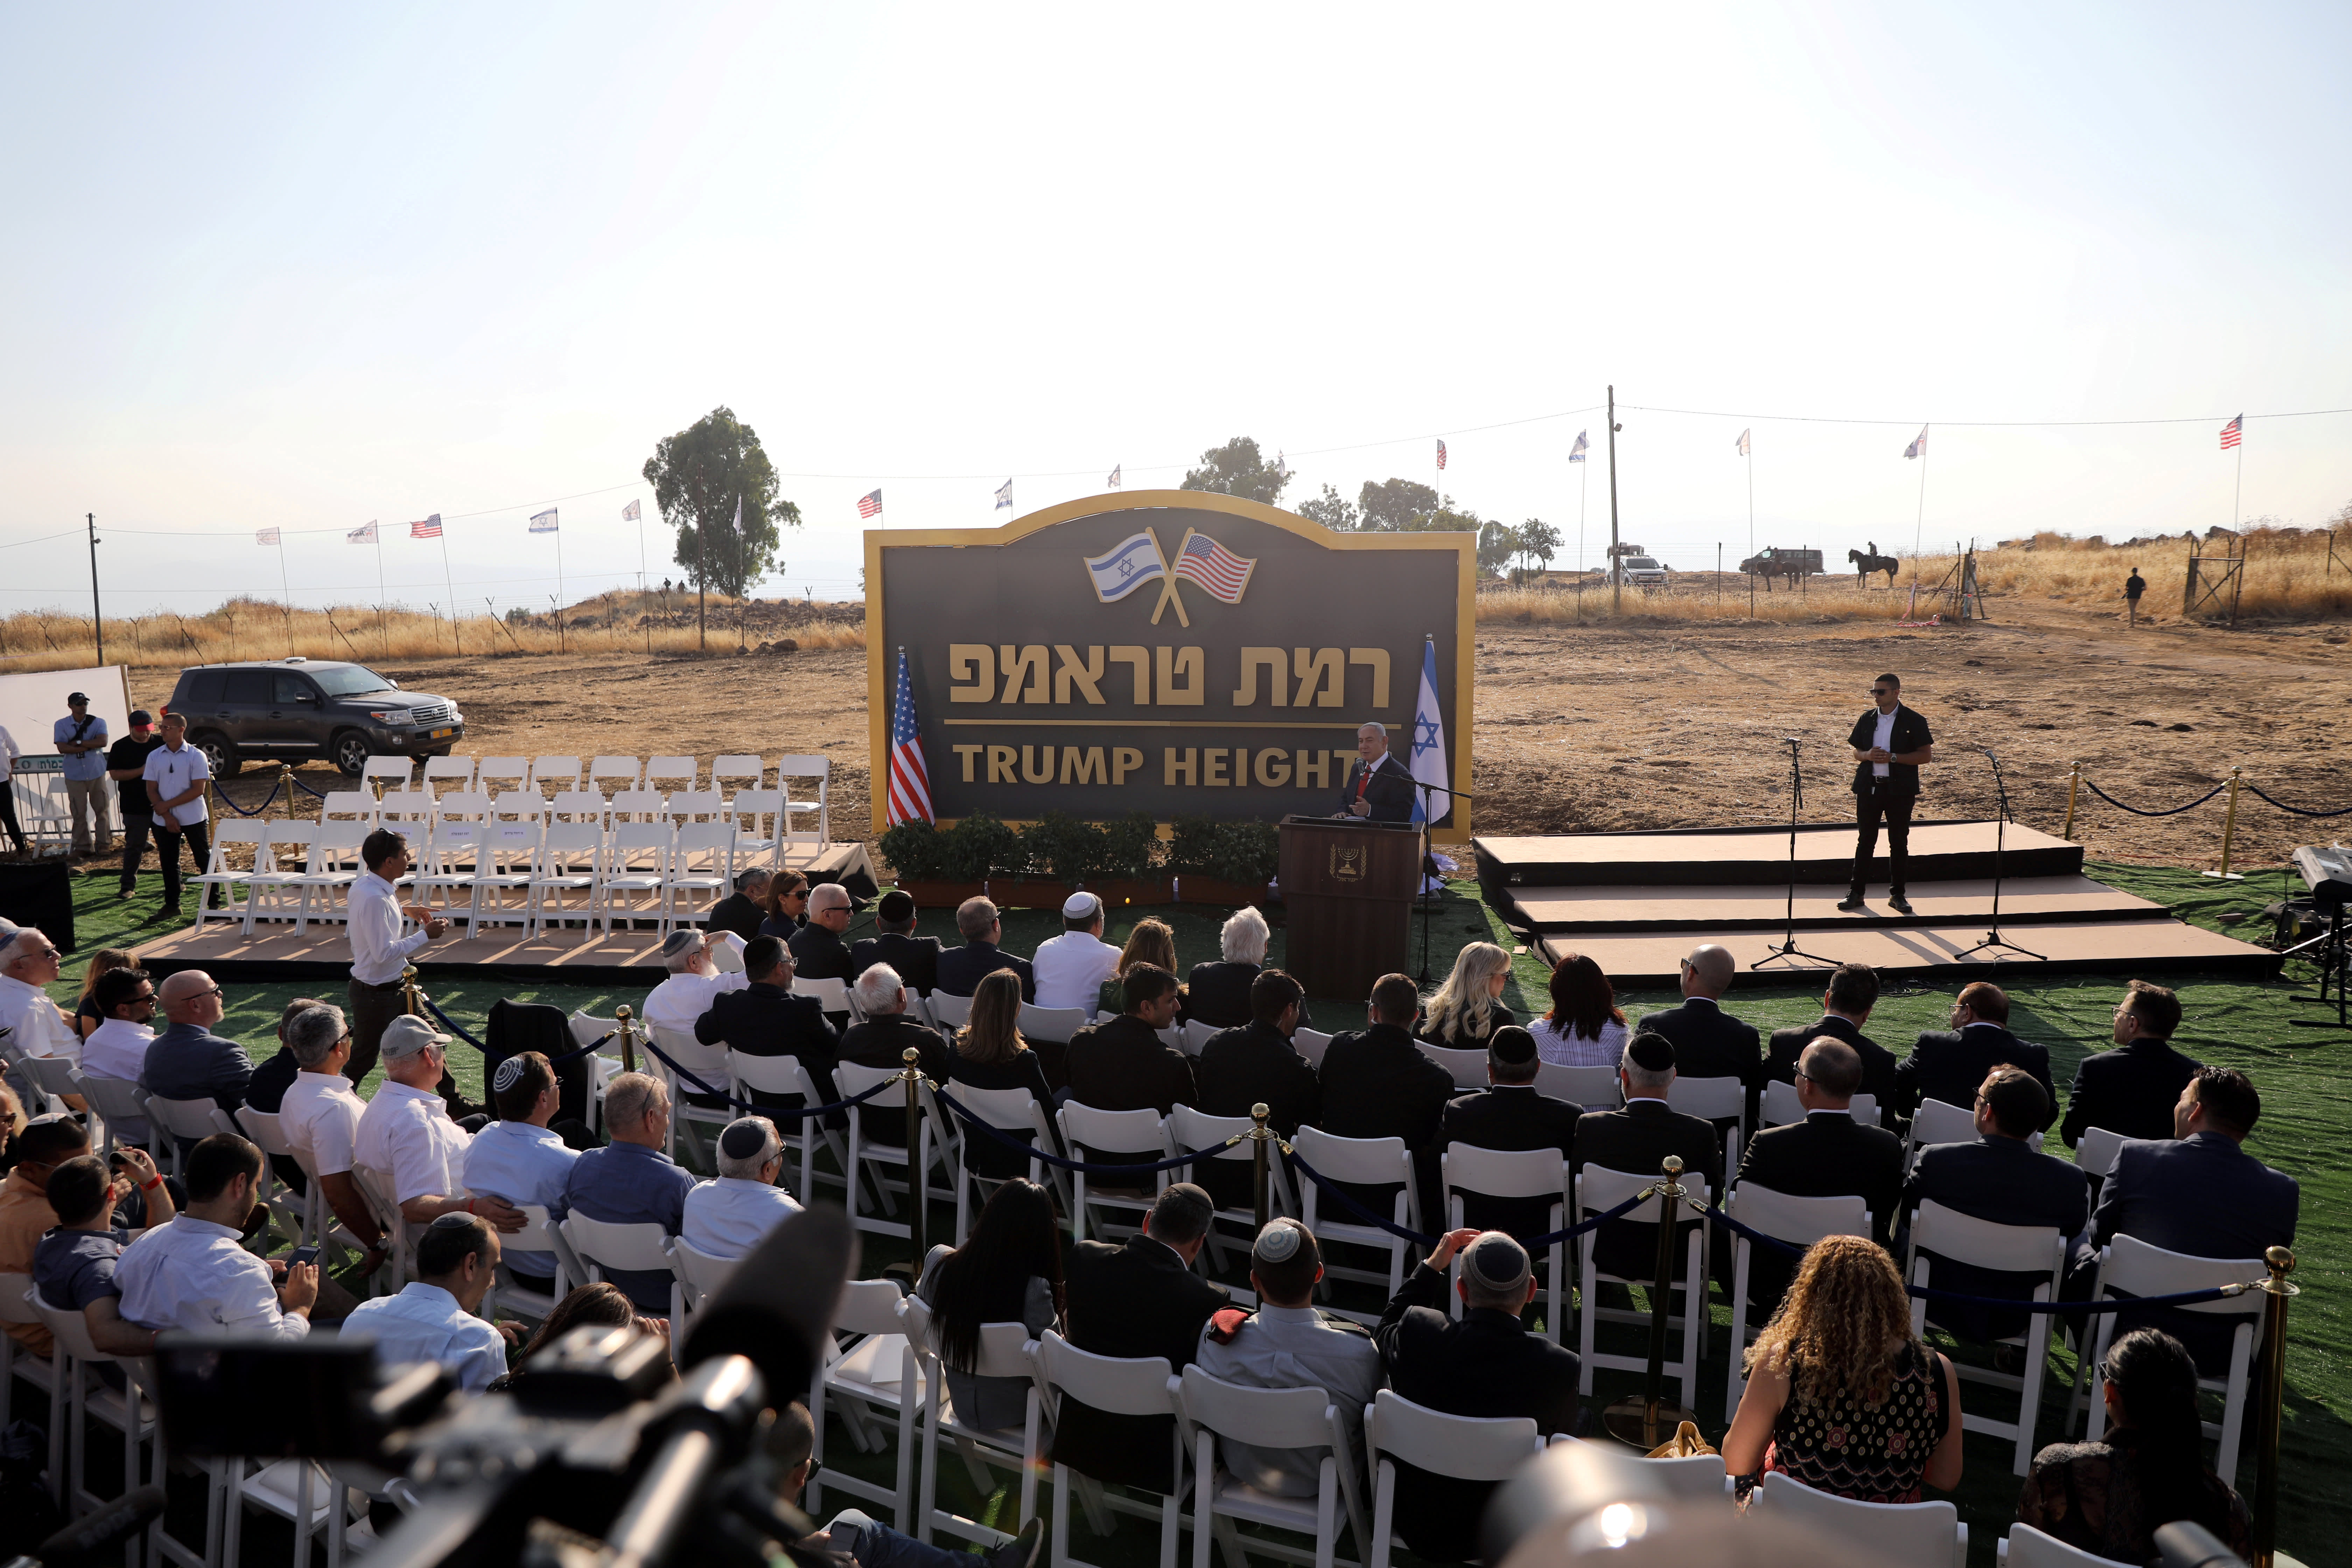 'Trump Heights': Netanyahu dedicates new settlement in Golan Heights to US president